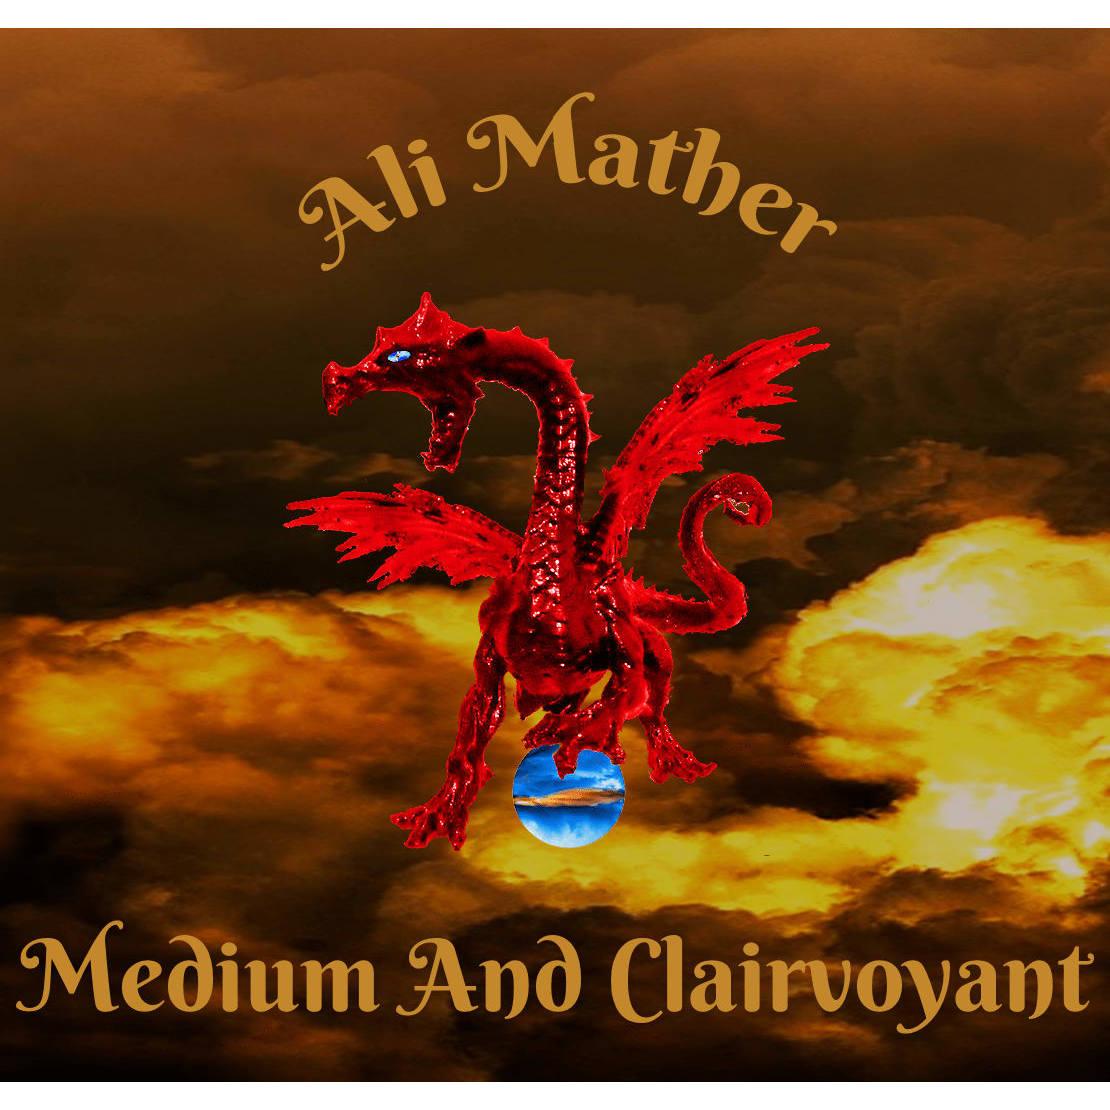 Ali Mather Medium & Clairvoyant - Pontefract, West Yorkshire WF9 3TF - 07825 889509 | ShowMeLocal.com